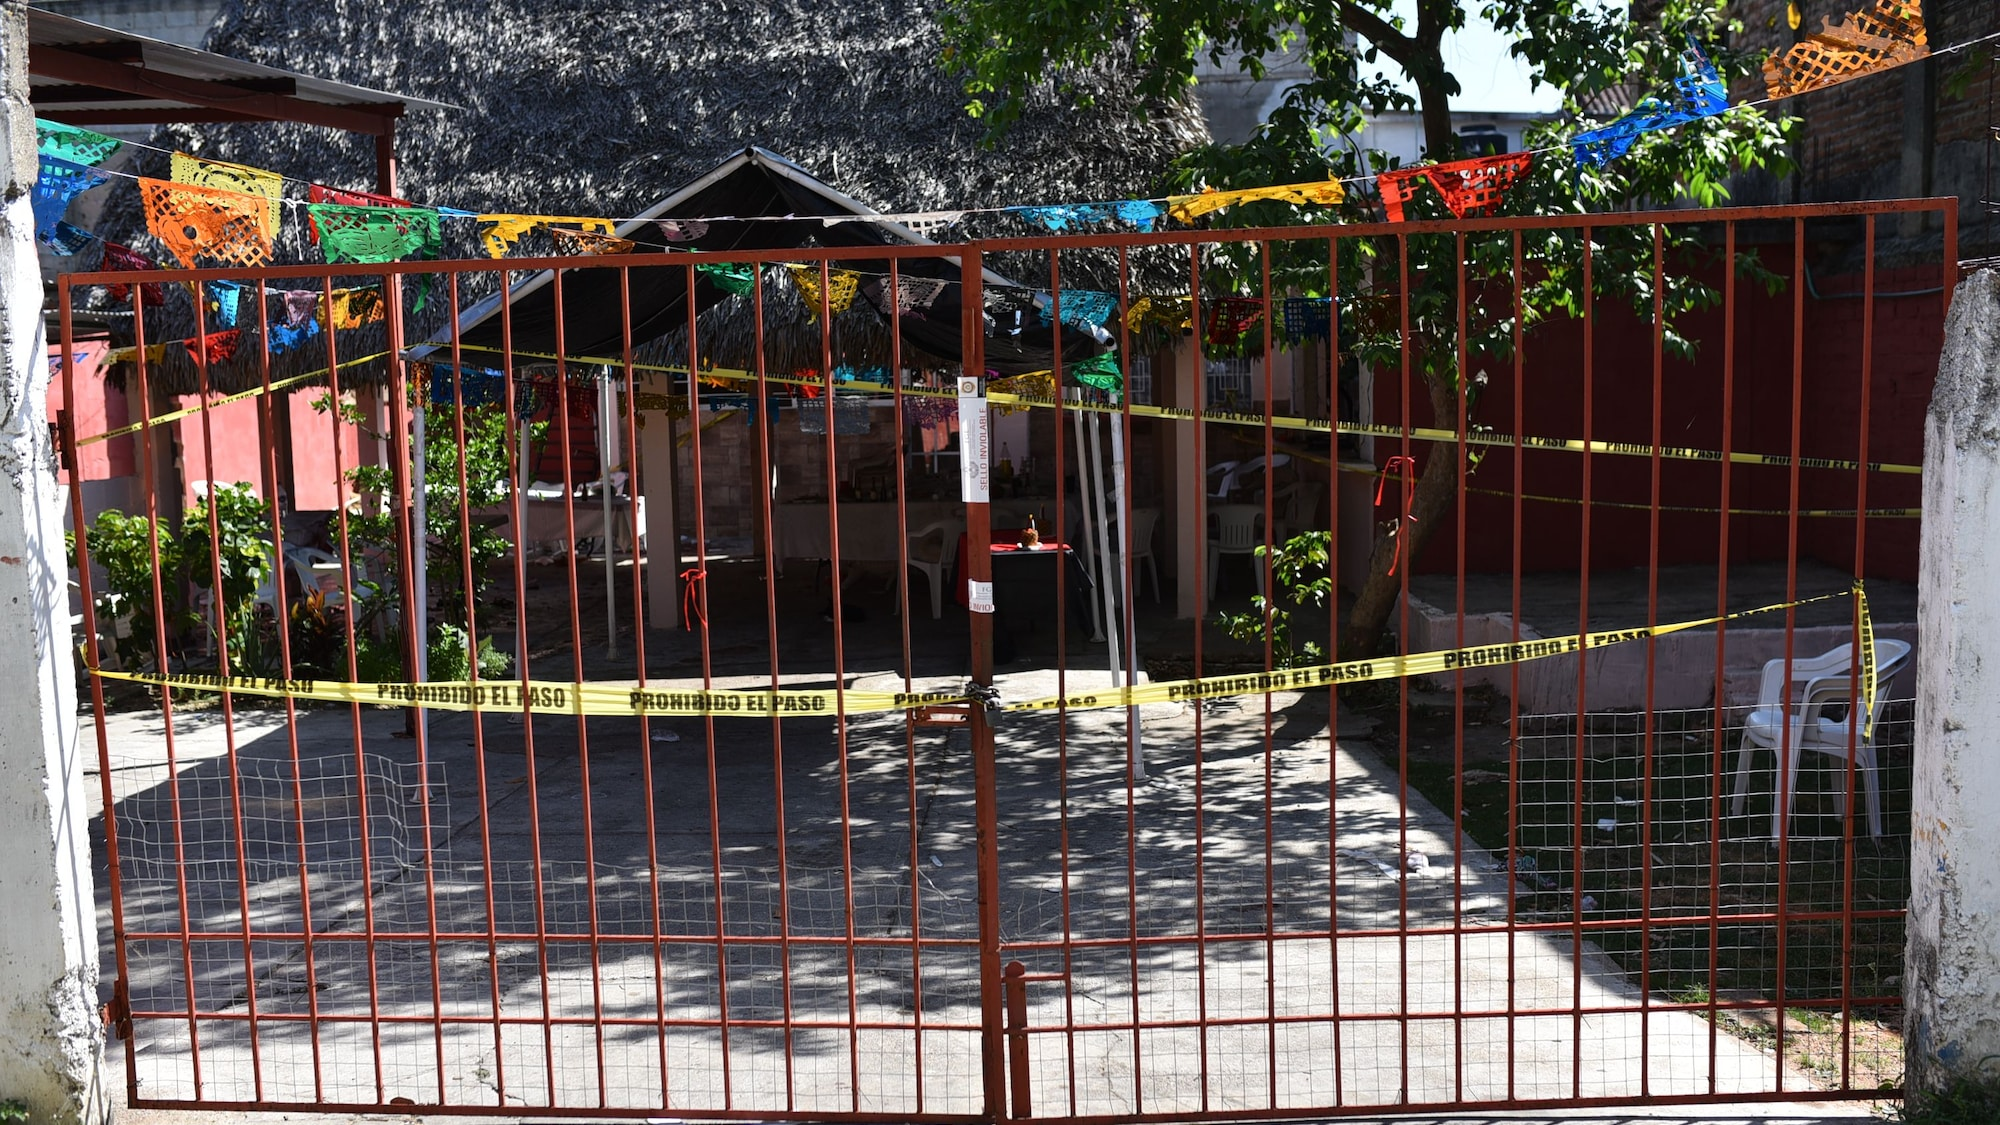 Attentat in Mexiko: 14 Menschen an Kindergeburtstag erschossen